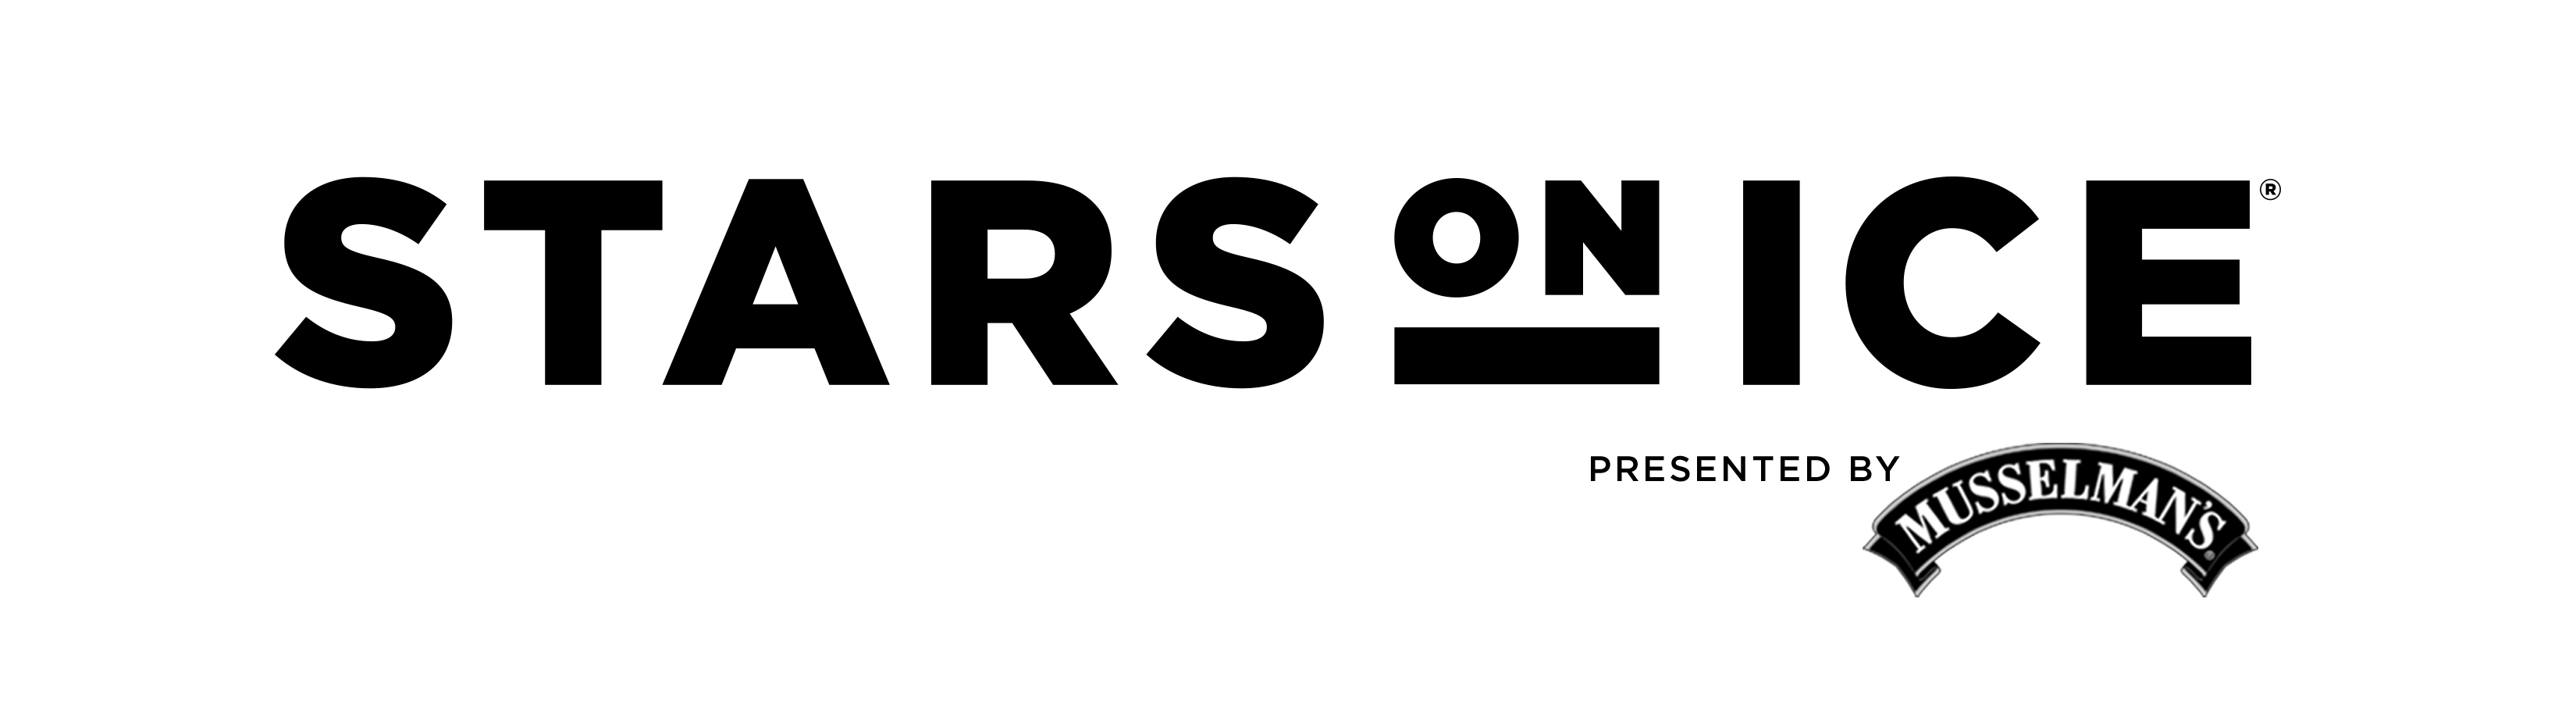 Stars on Ice B/W Logo